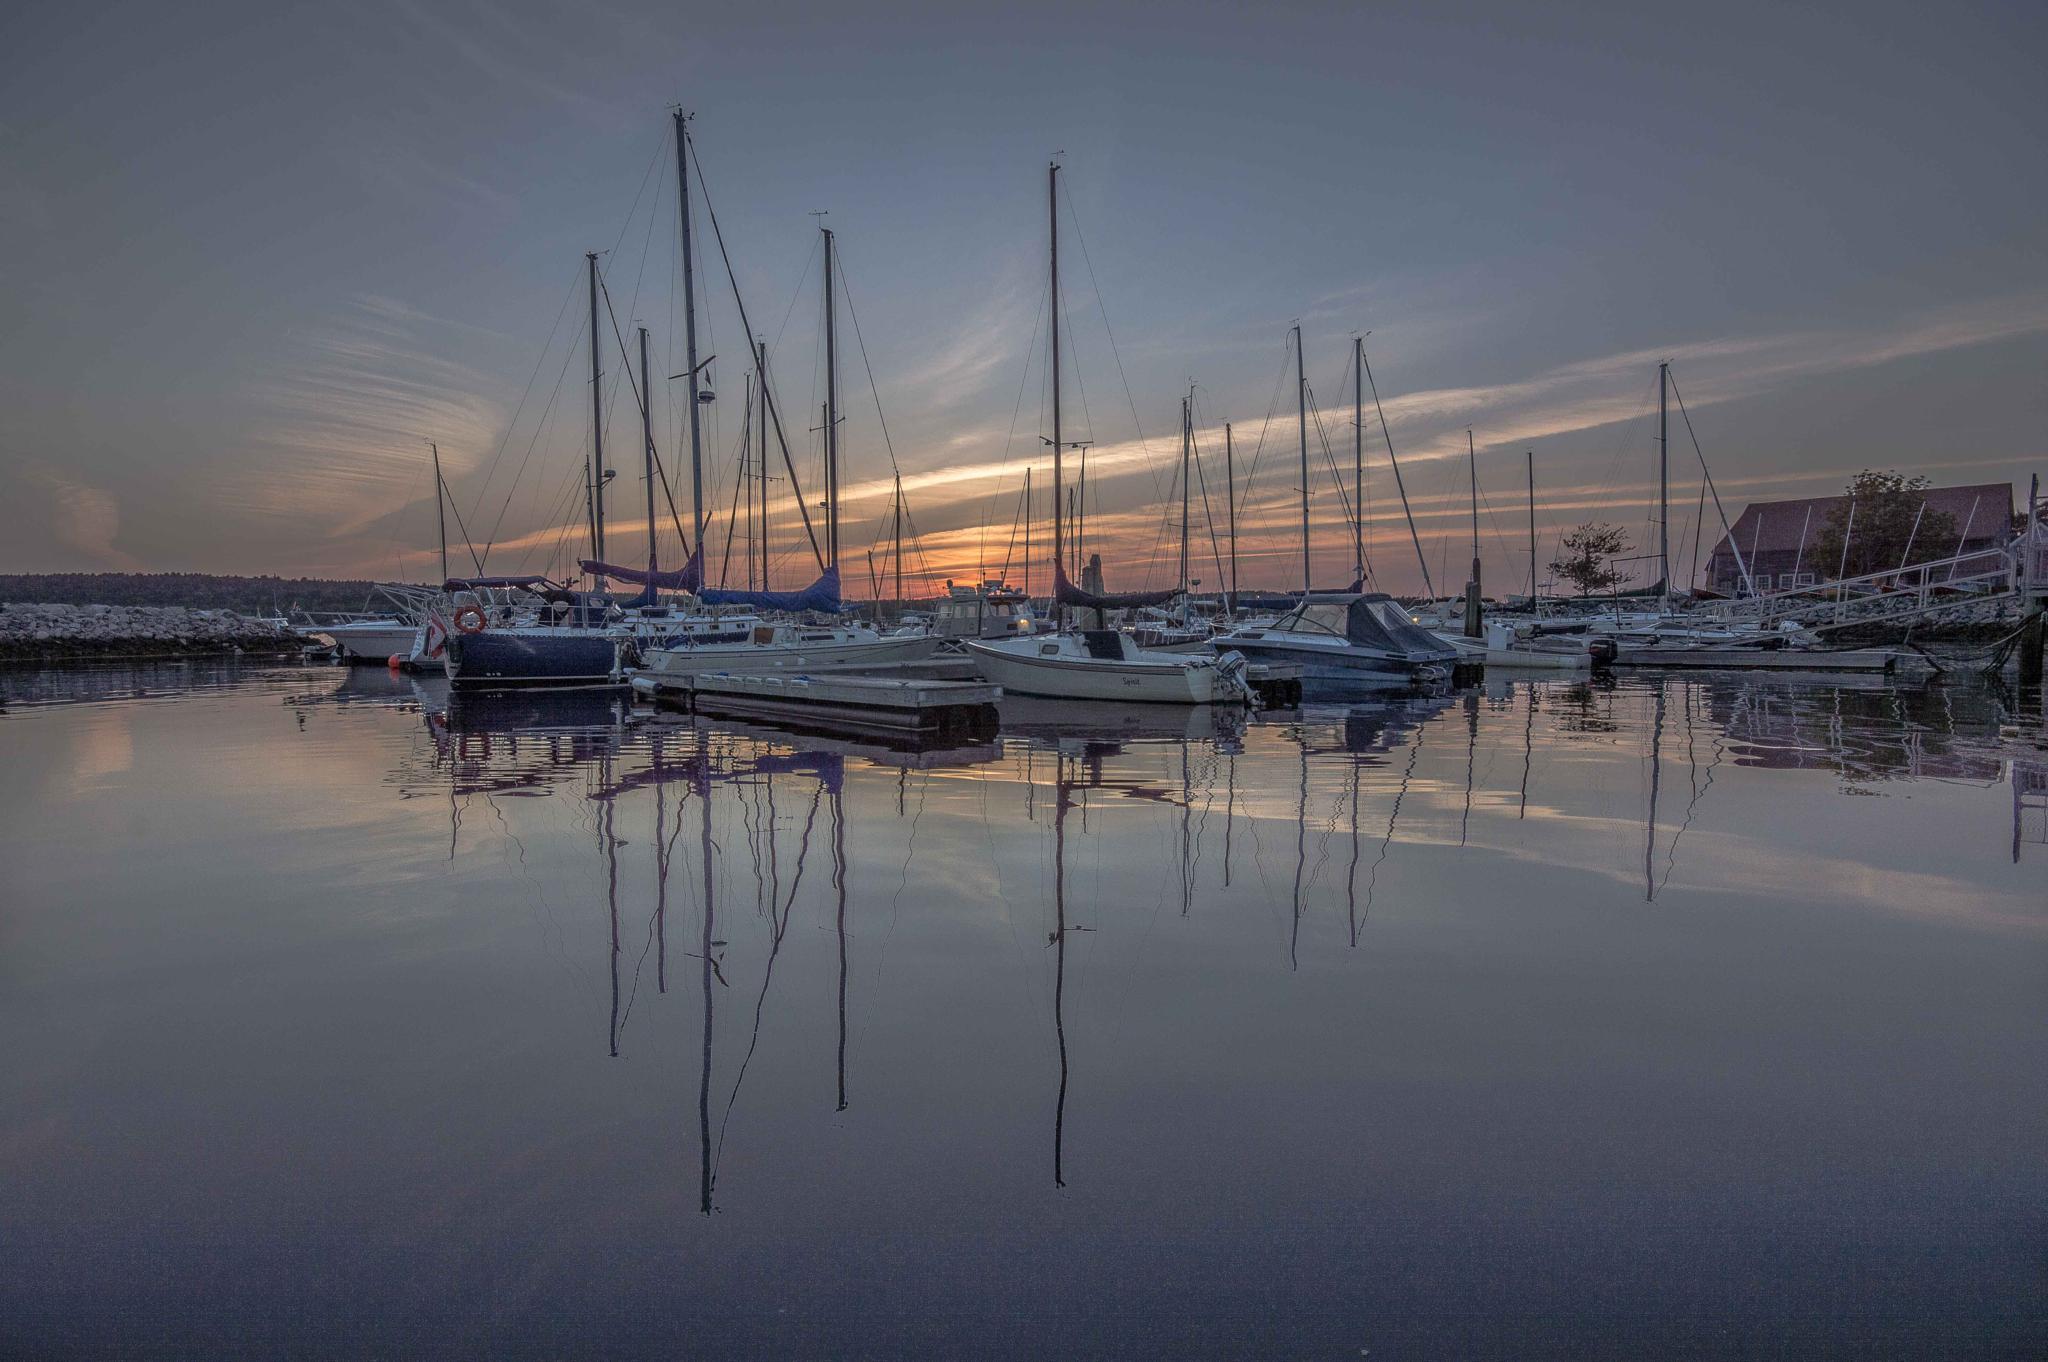 Yacht club by paulhamilton969952